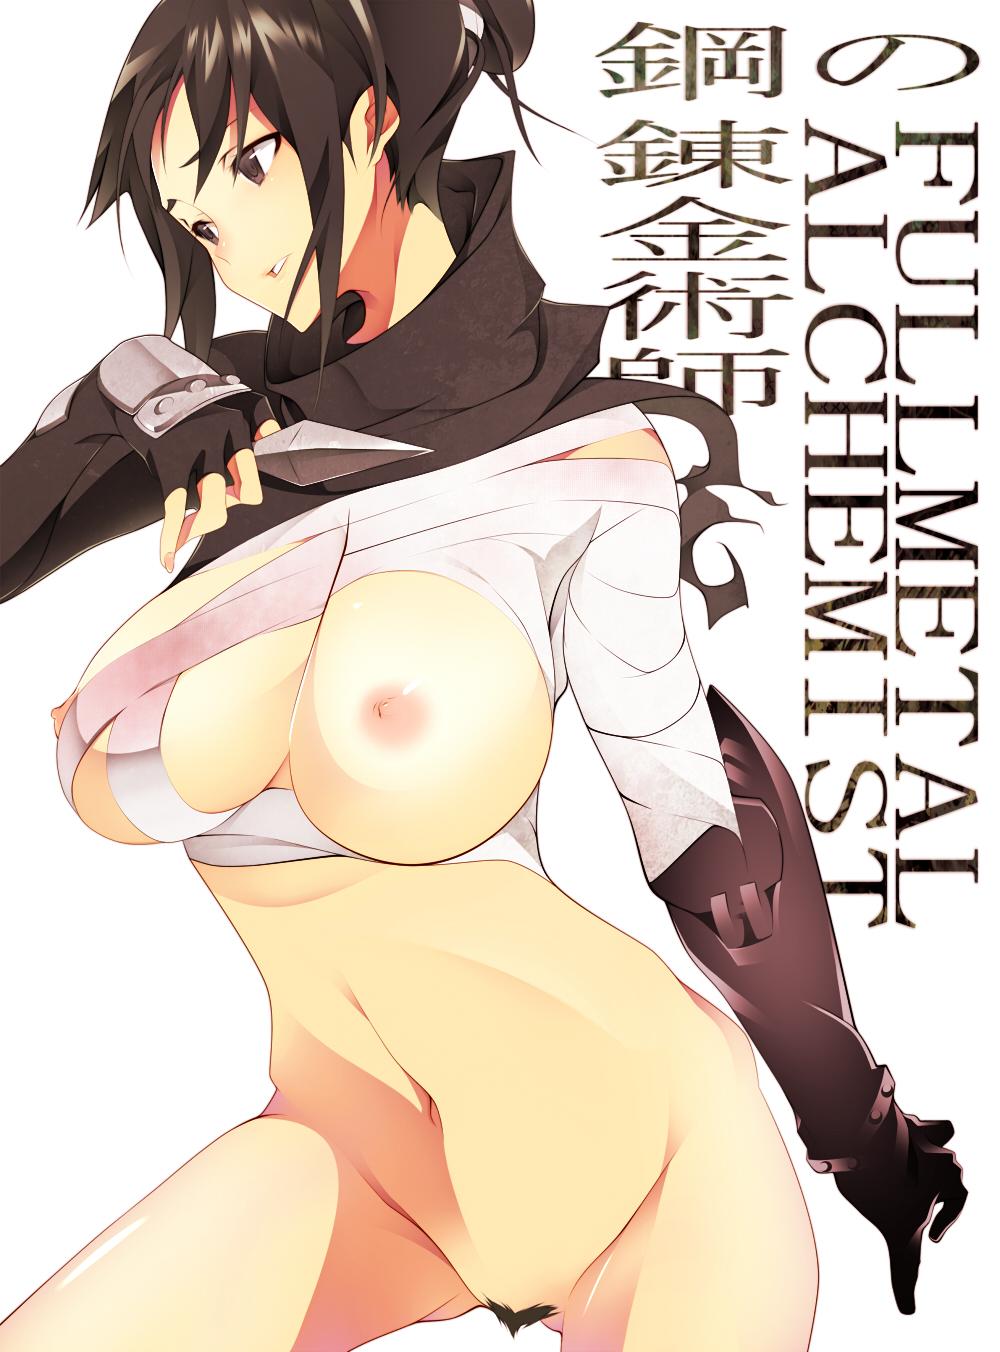 lan alchemist fan brotherhood fullmetal Call of duty ww2 quartermaster